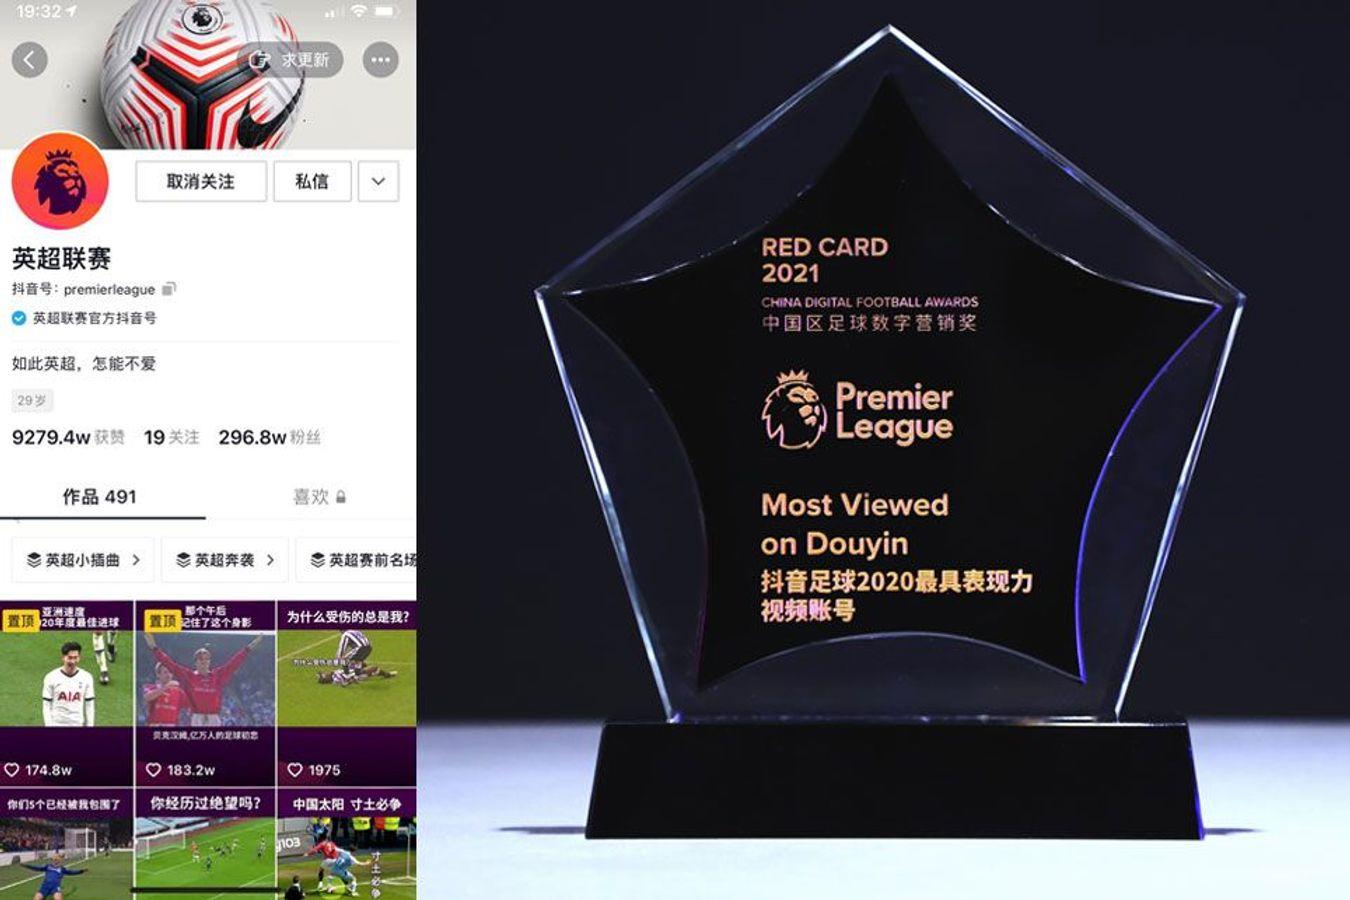 PL Mailman Red Card Douyin award